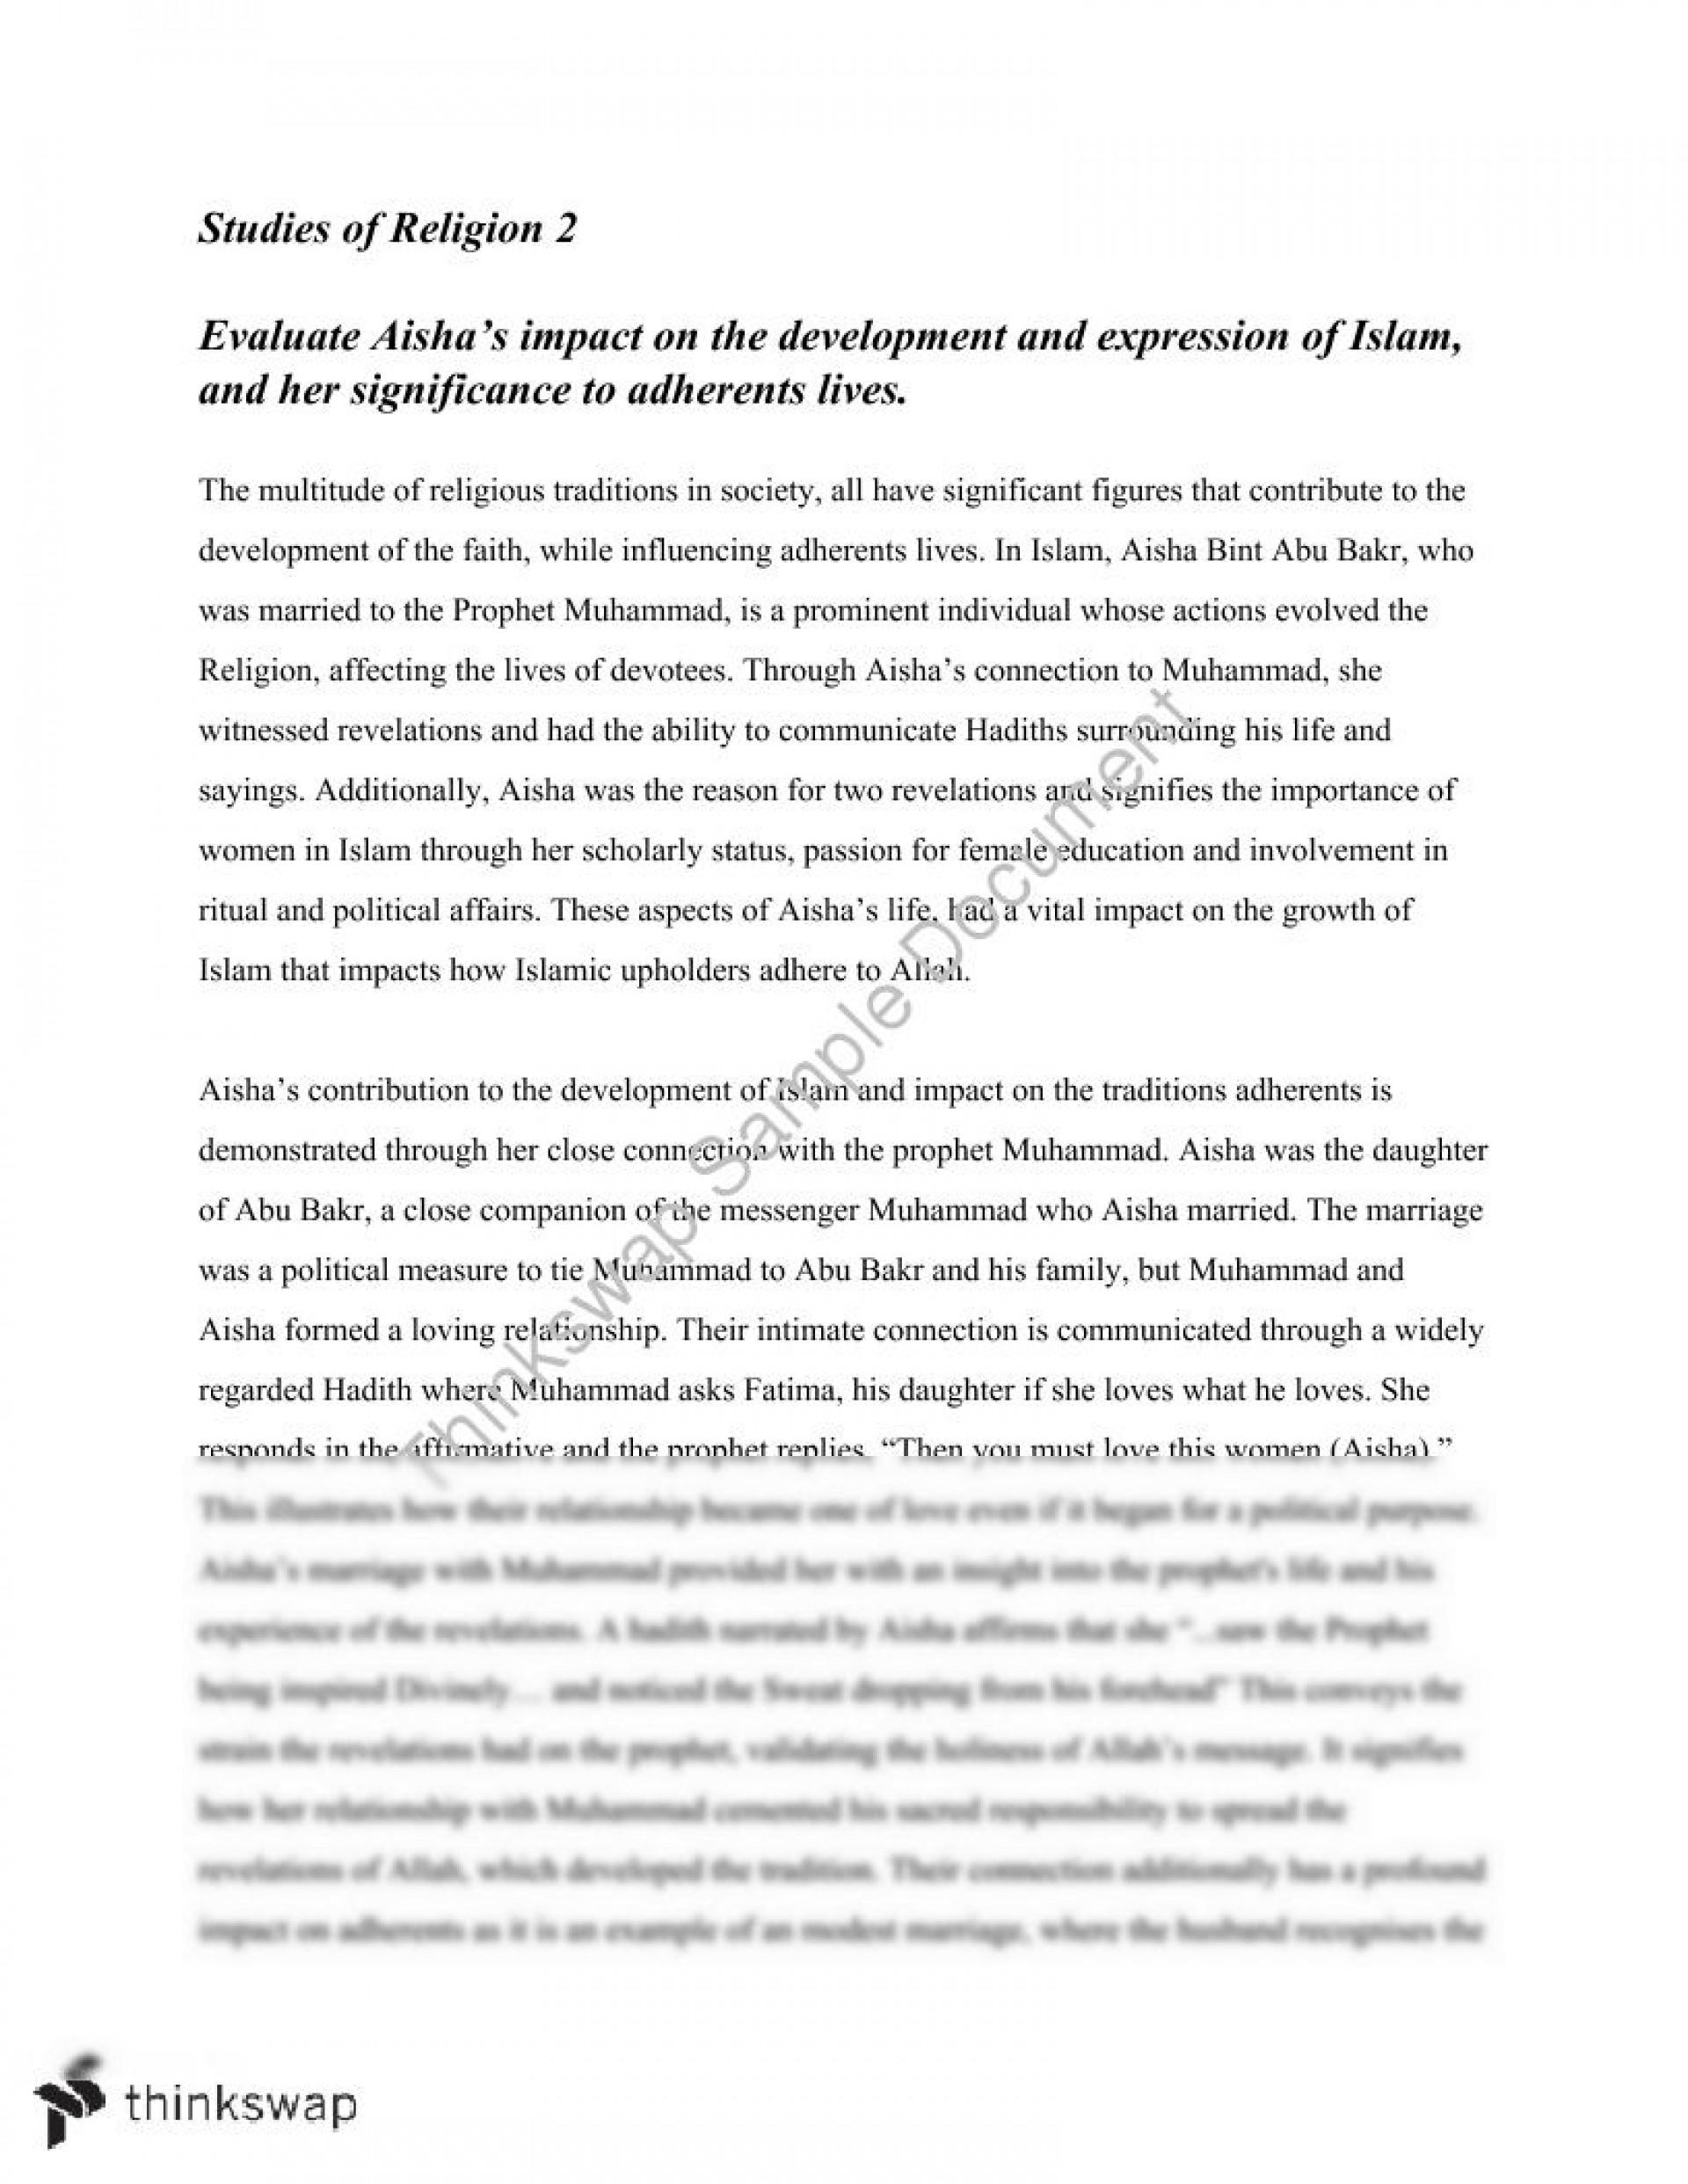 002 Essay On Islam Example 71449 Aisha Fadded41 Awful Persuasive Islamophobia My City Islamabad In Urdu Religion Hindi 1920